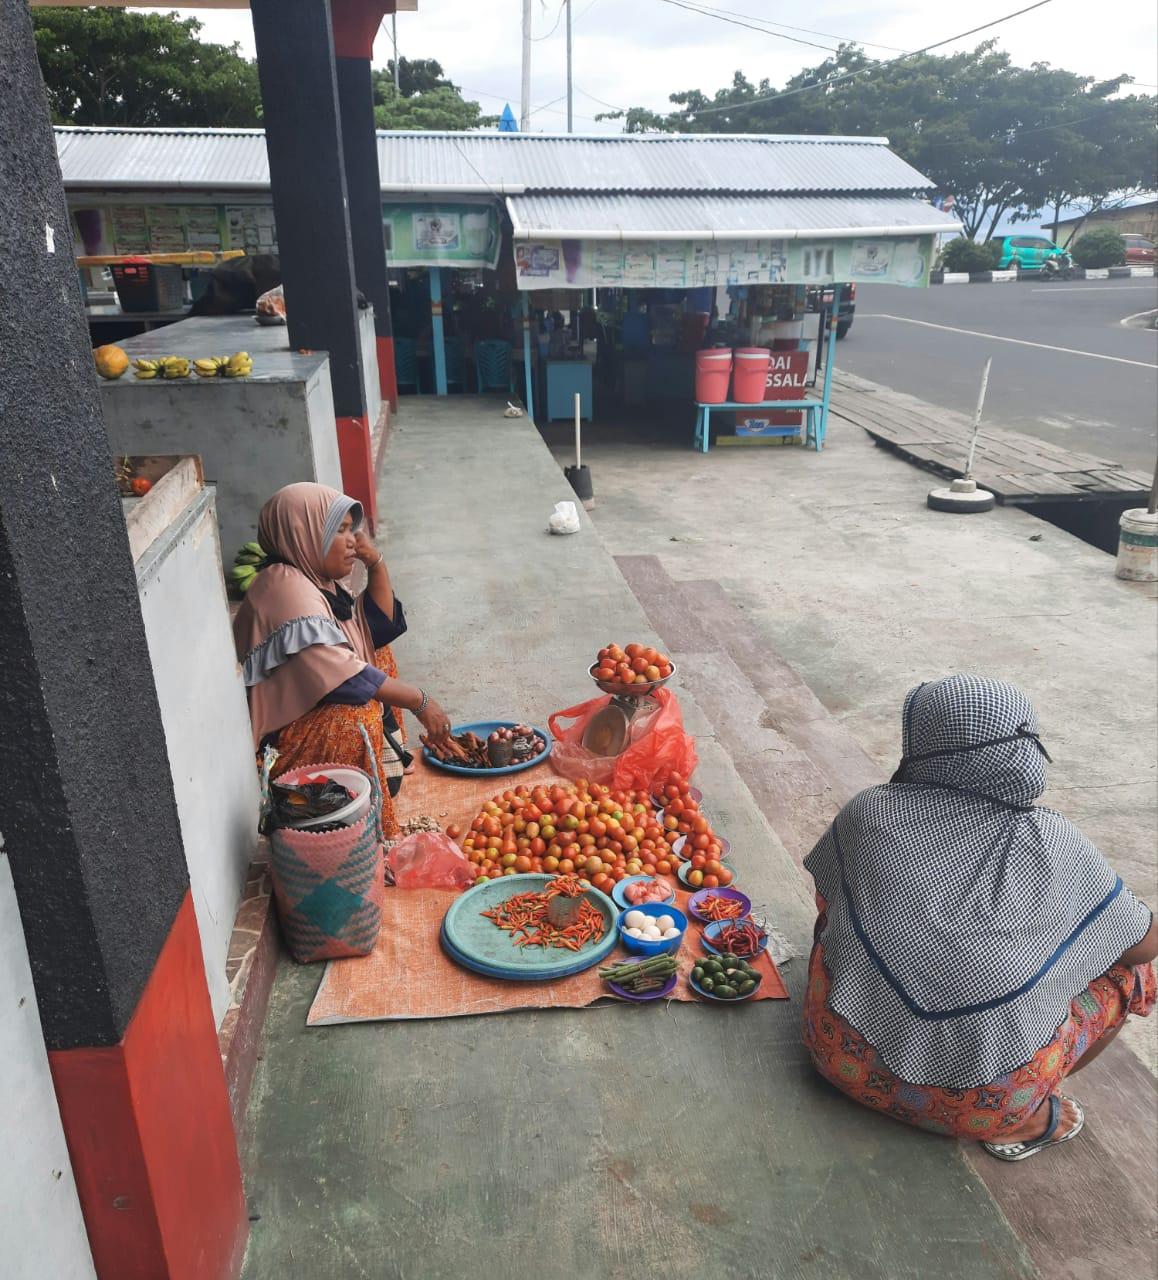 SUASANA penjual rica dan tomat di pasar Sarimalaha, Tidore